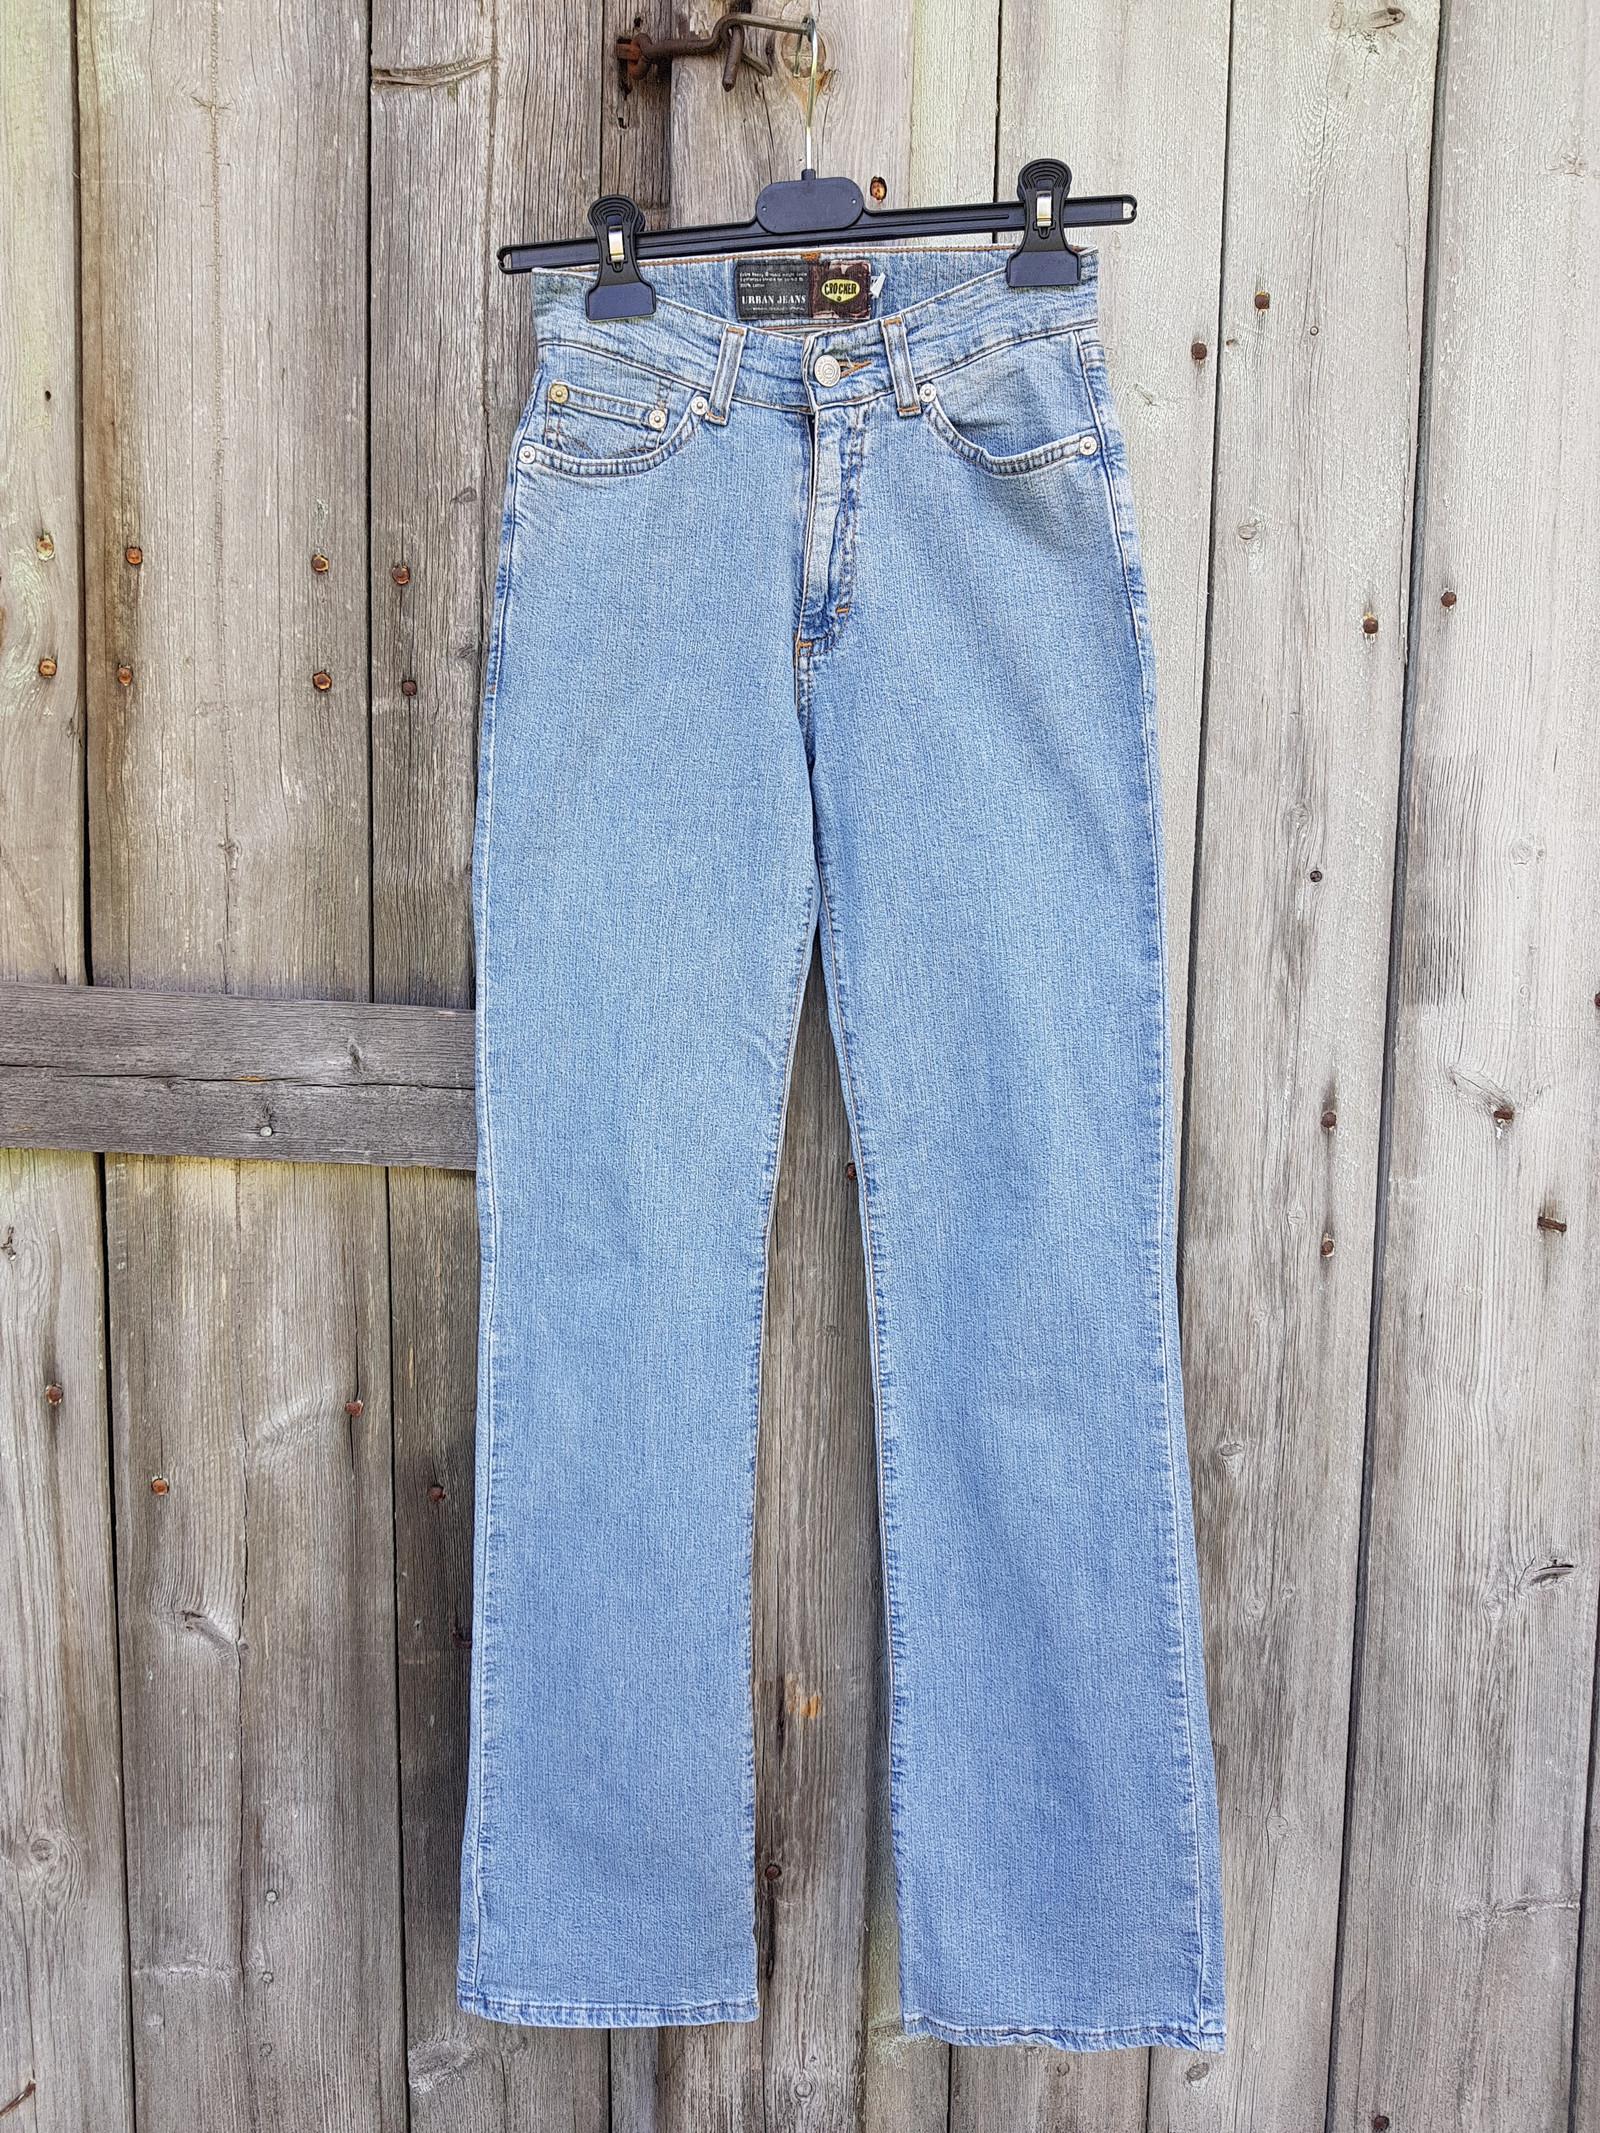 Retro Crocker bukse jeans. Str. XS. Vintage Denimbukse